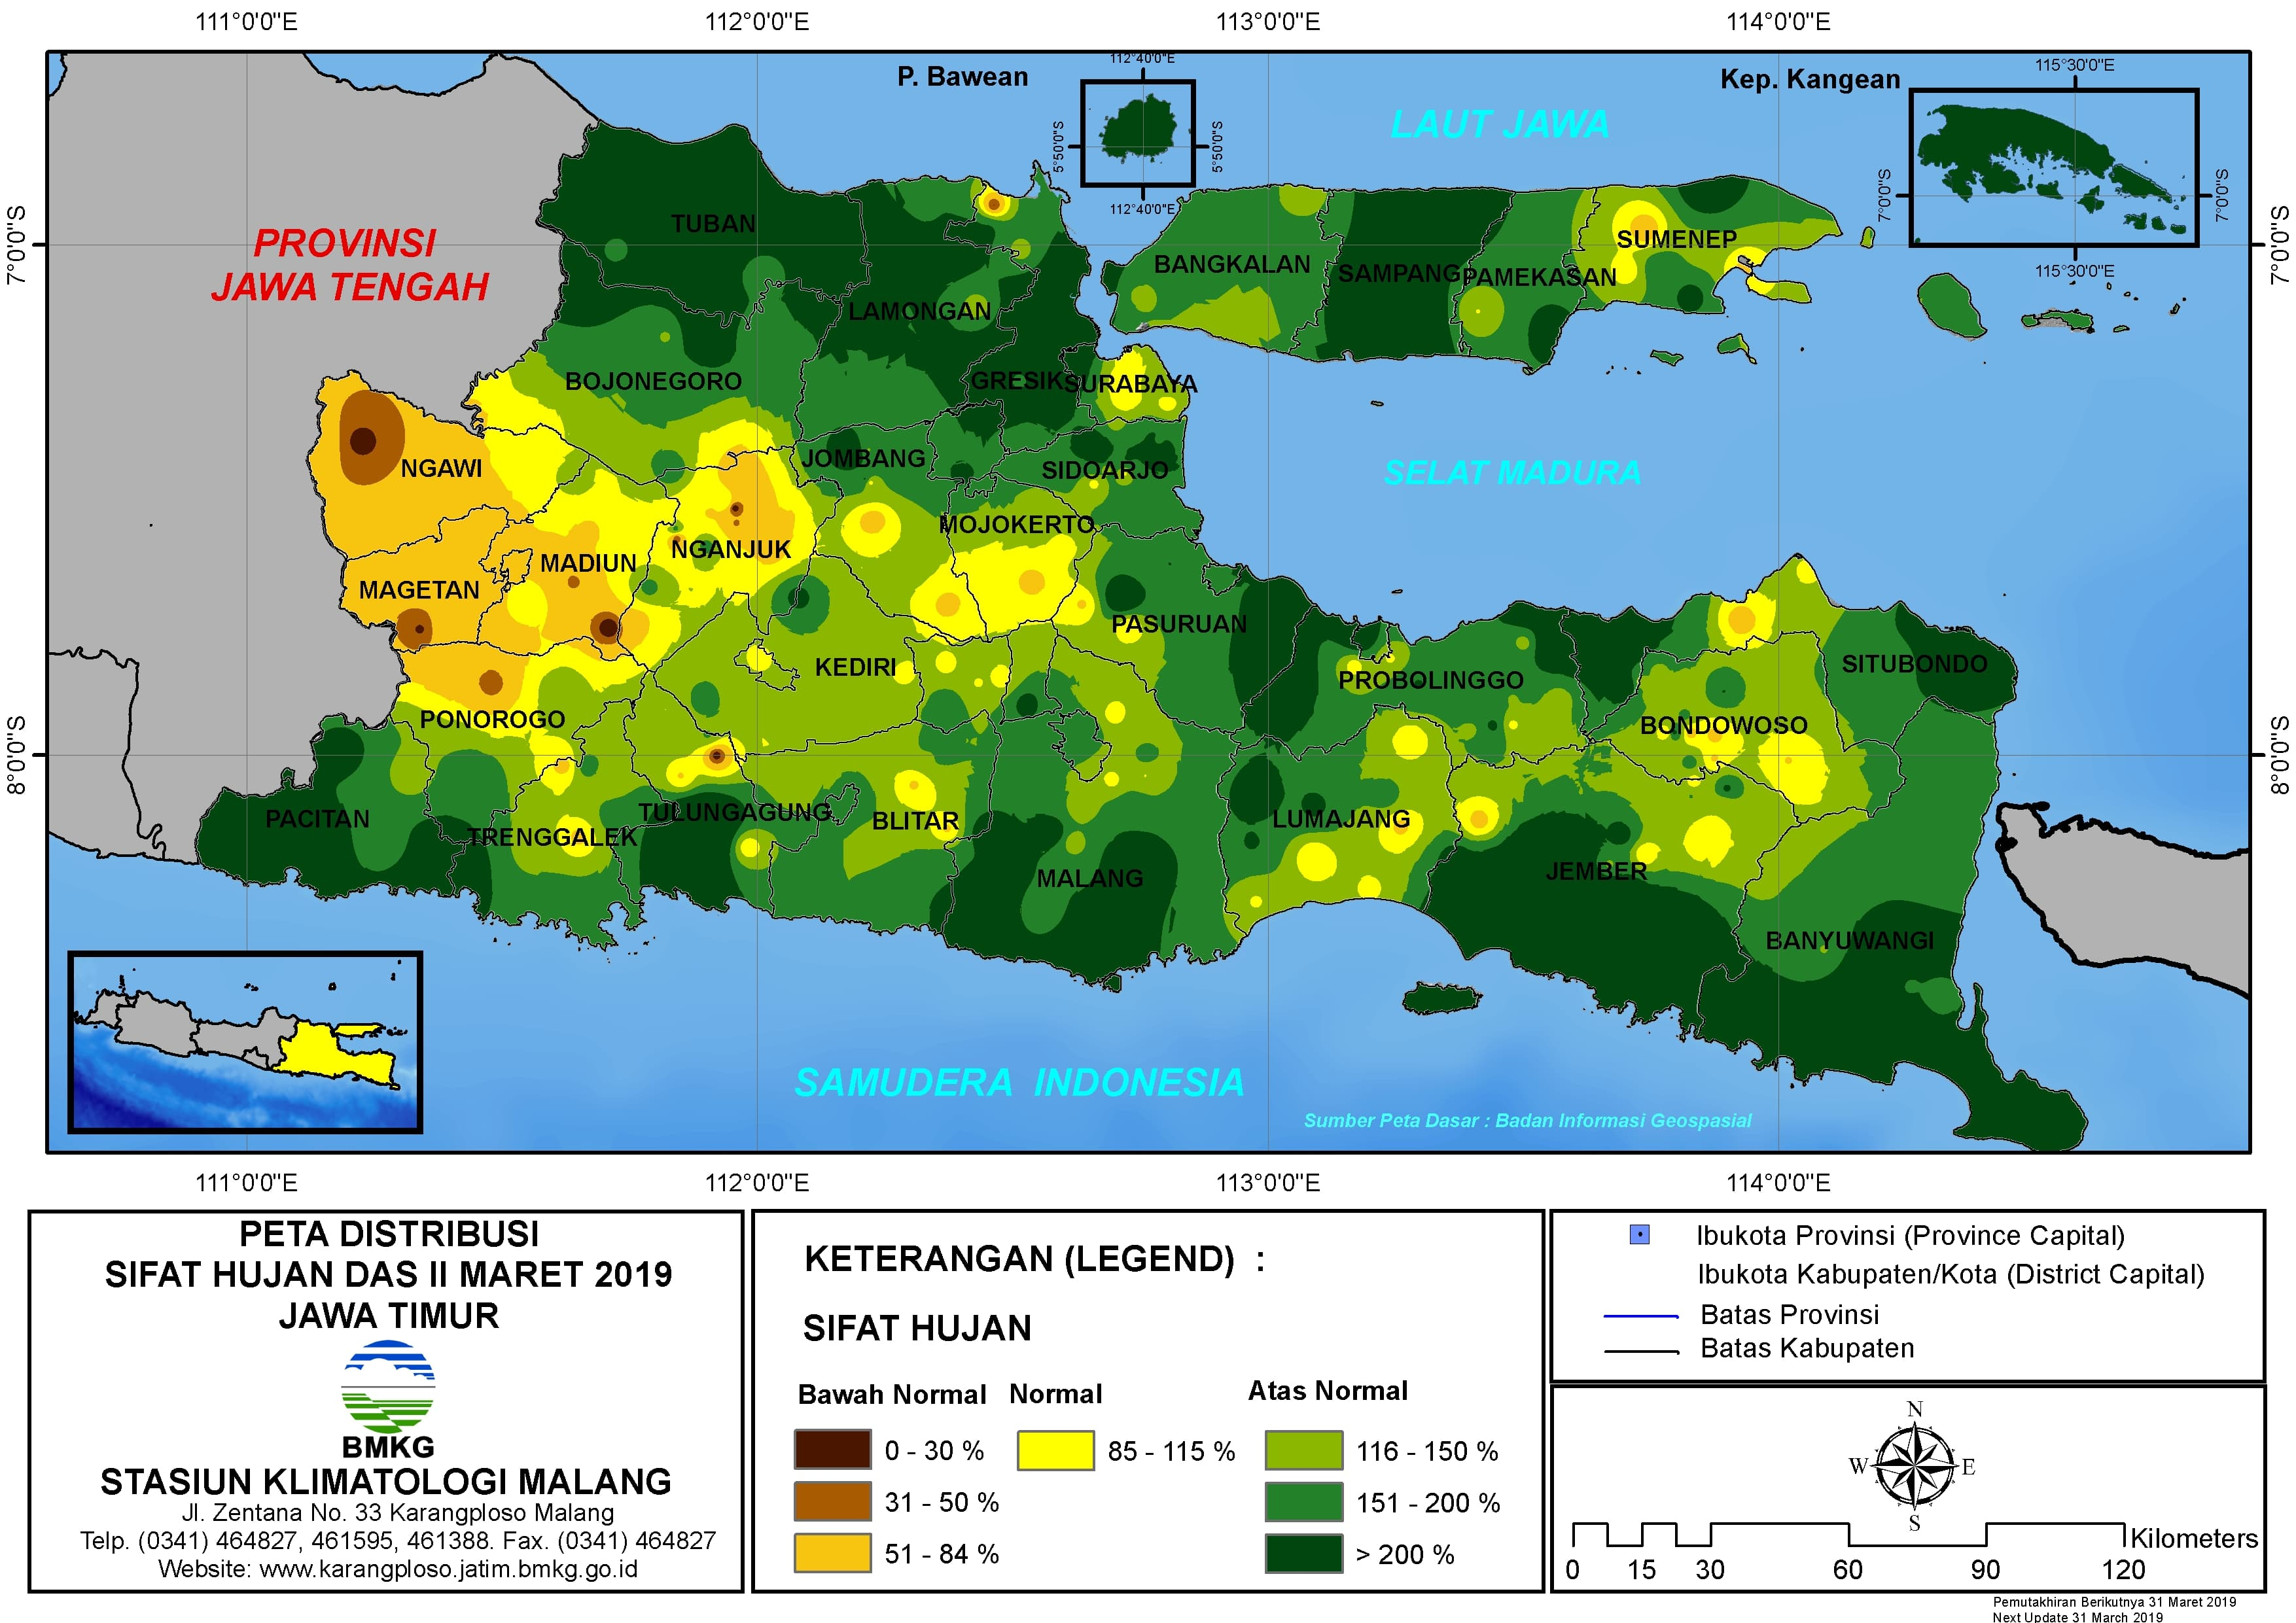 Peta Analisis Distribusi Sifat Hujan Dasarian II Maret 2019 di Provinsi Jawa Timur